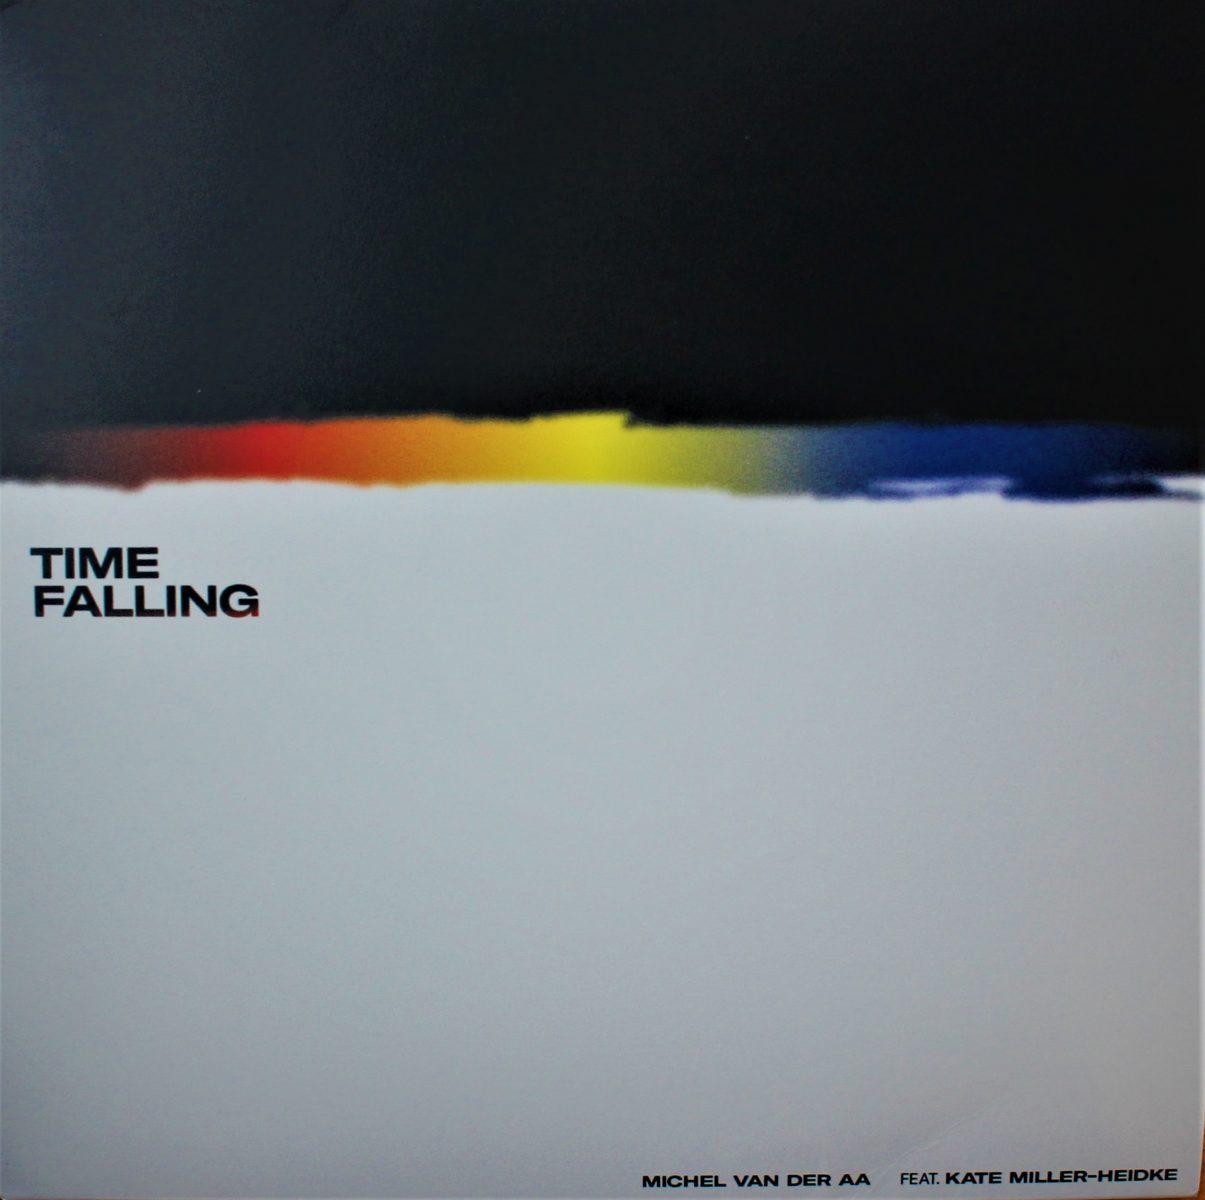 Michel van der Aa, Time Falling   The Vinyl Anachronist